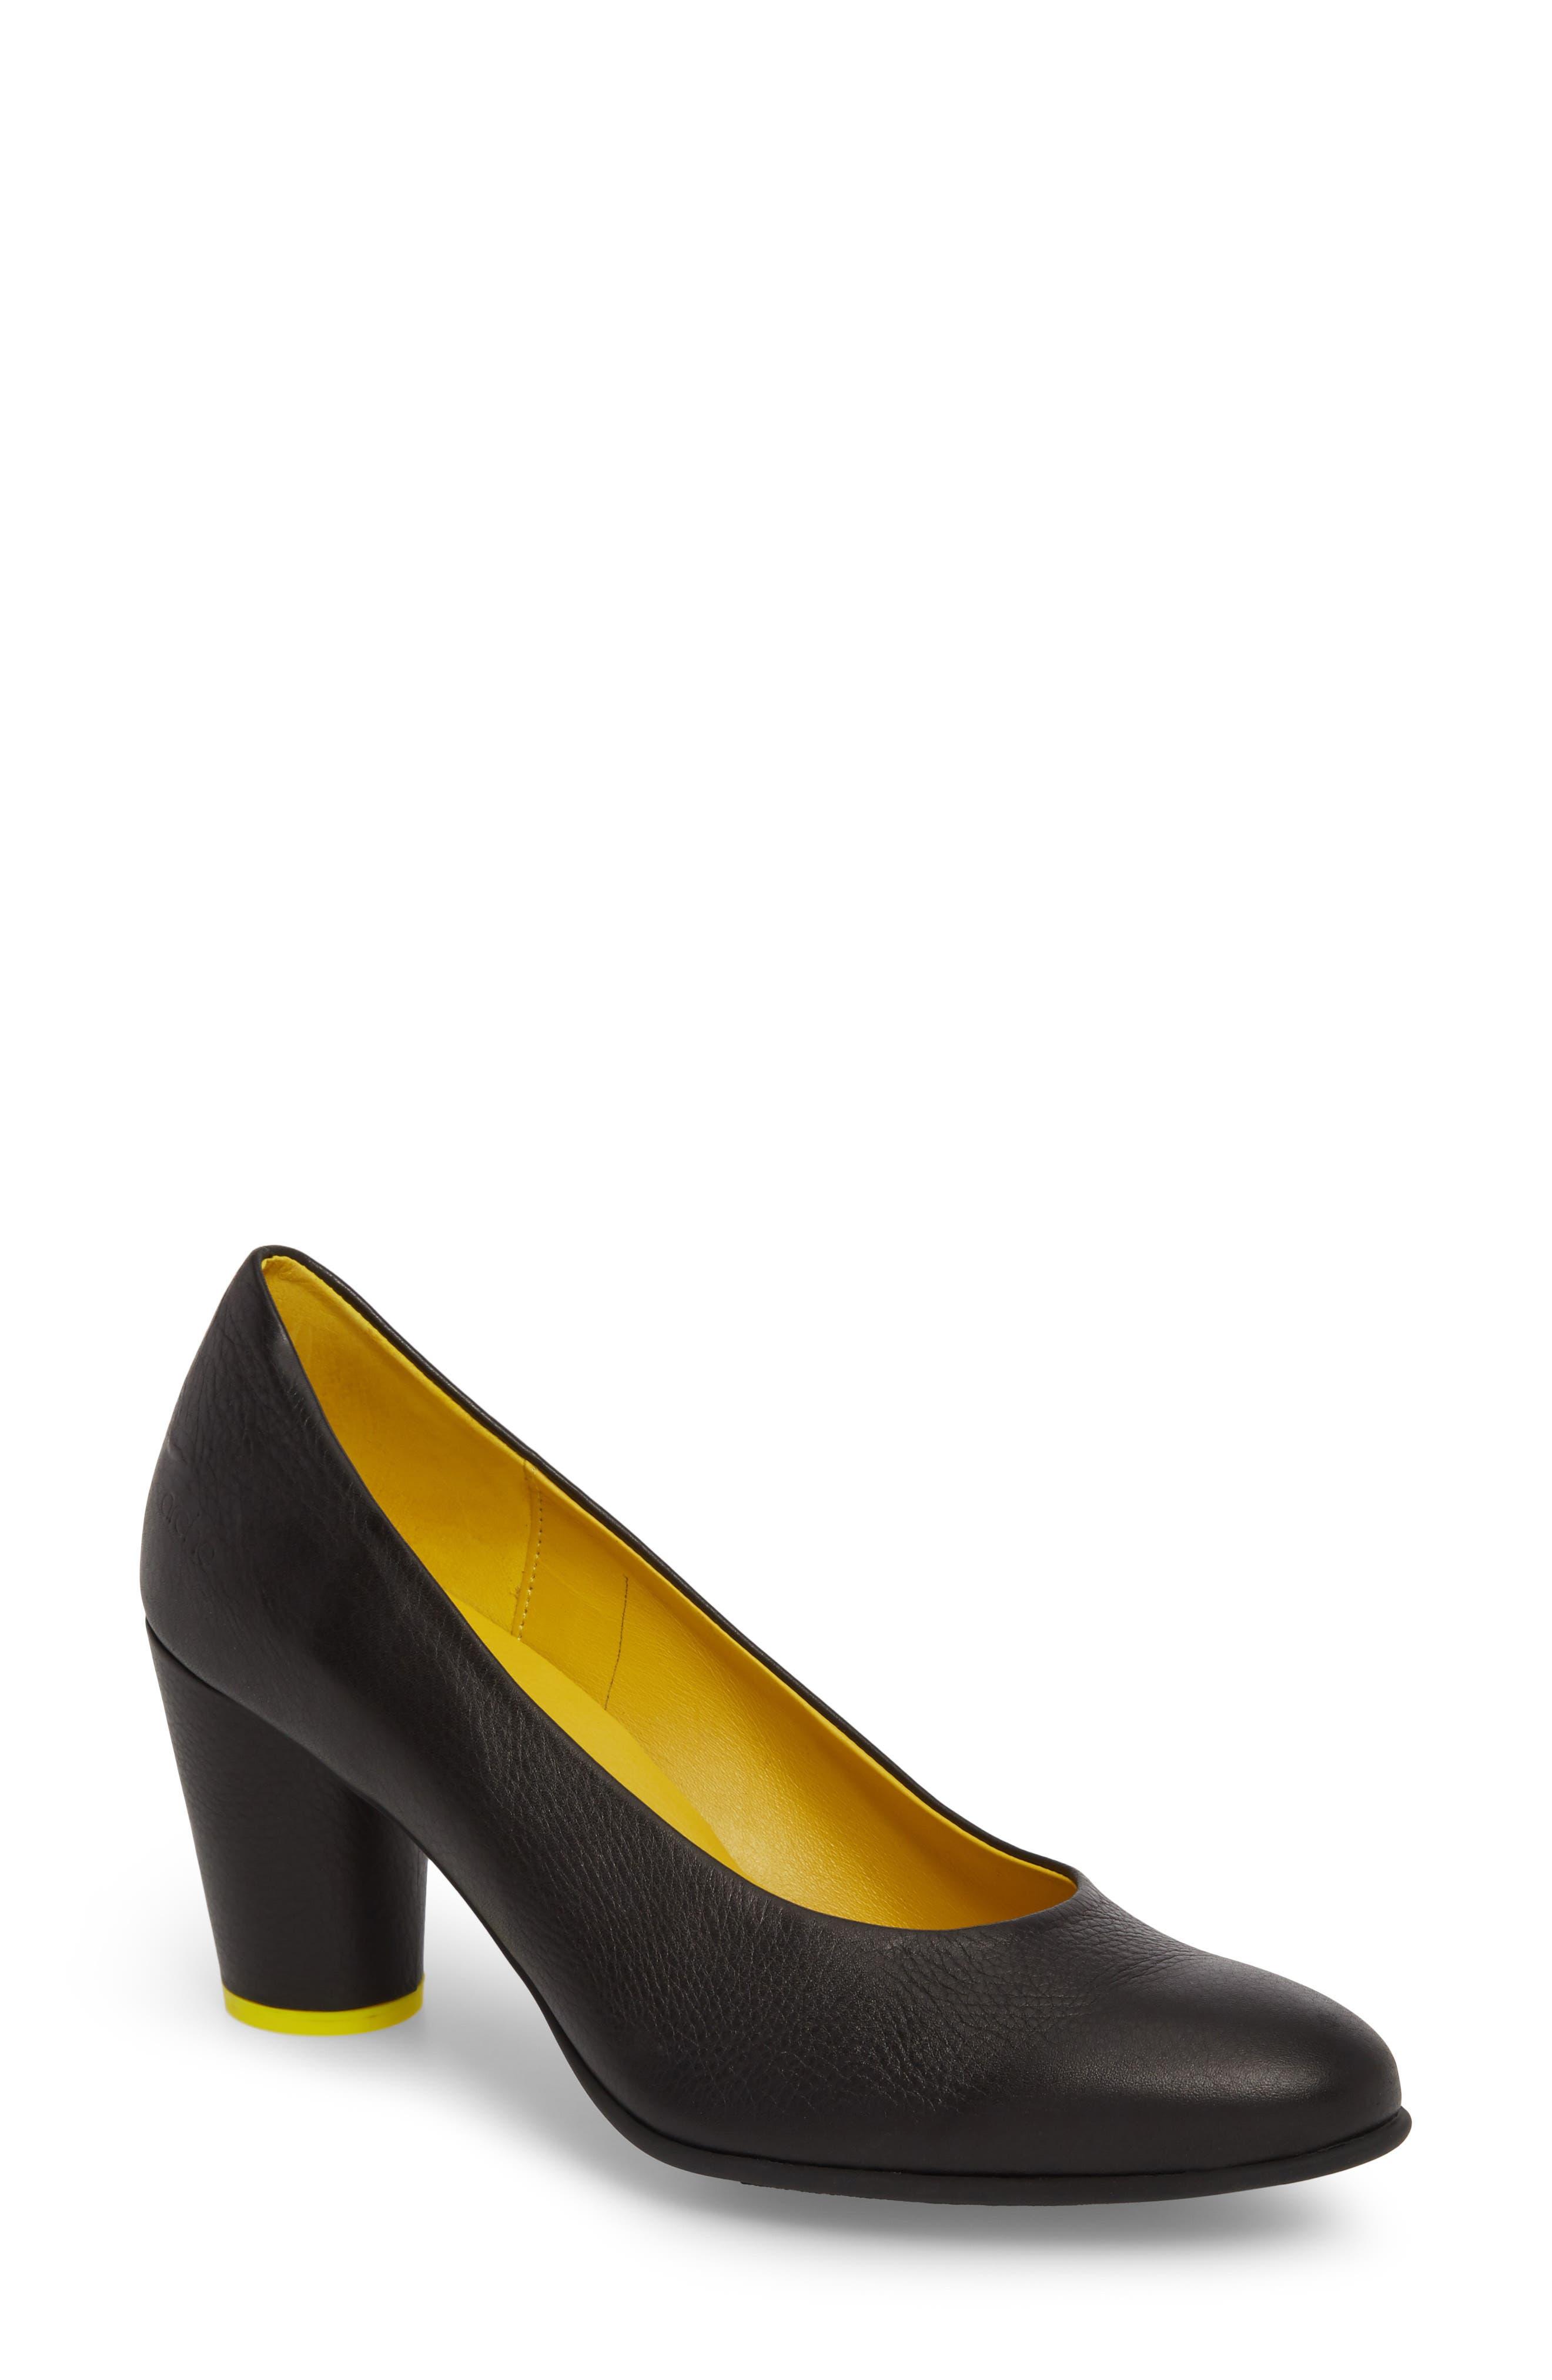 Kloemi Pump,                             Main thumbnail 1, color,                             Noir/ Mimosa Leather